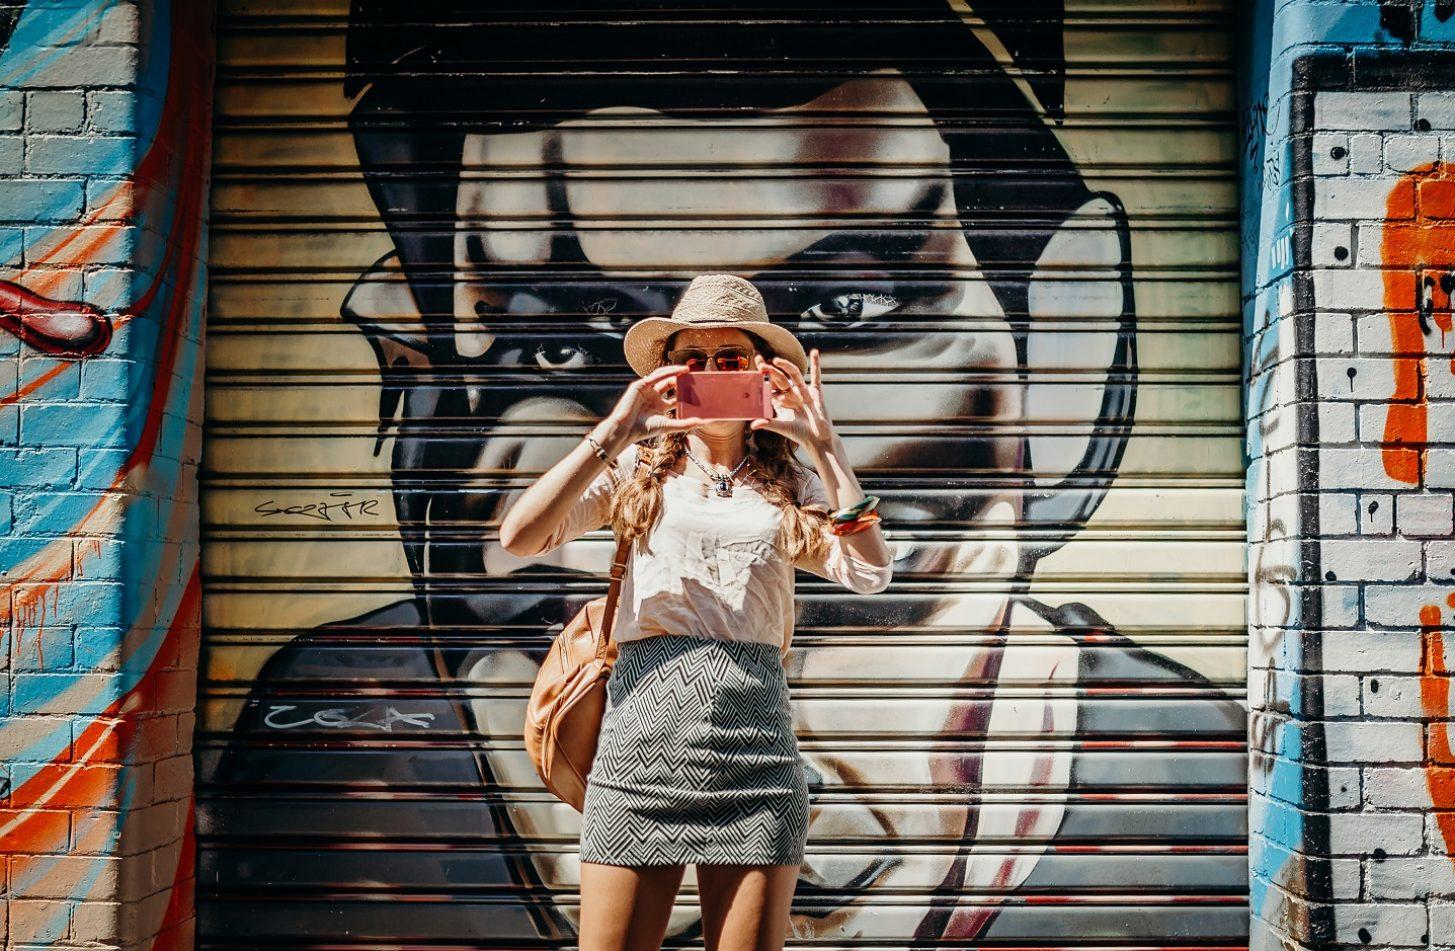 MELBOURNE, AUSTRALIA - March 12, 2017: Tourist taking a photo of